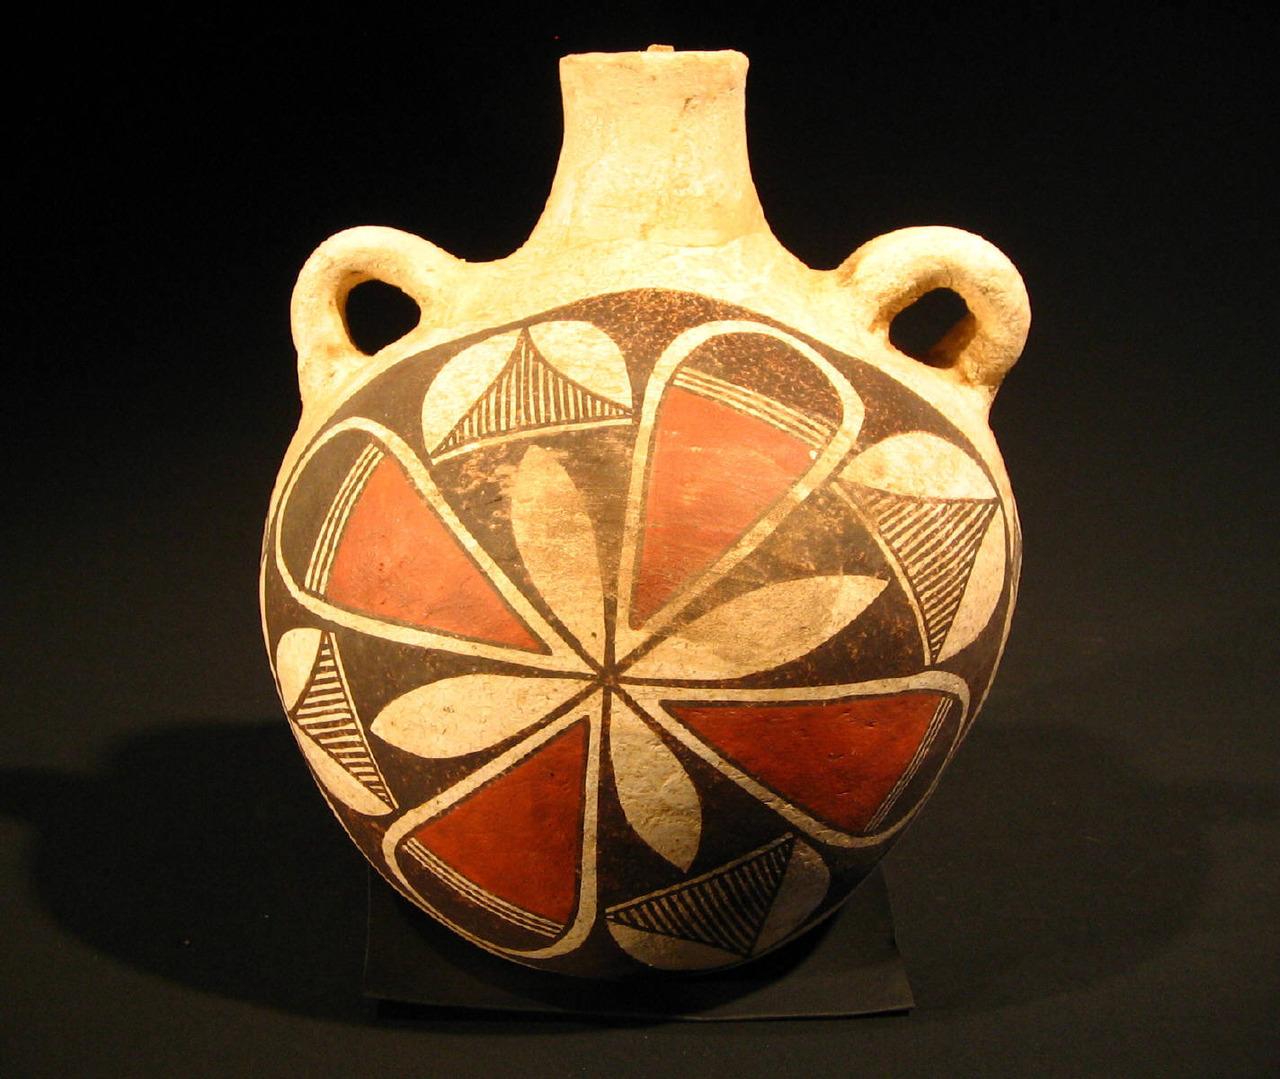 Acoma Pueblo Pottery,1920, artist unknown